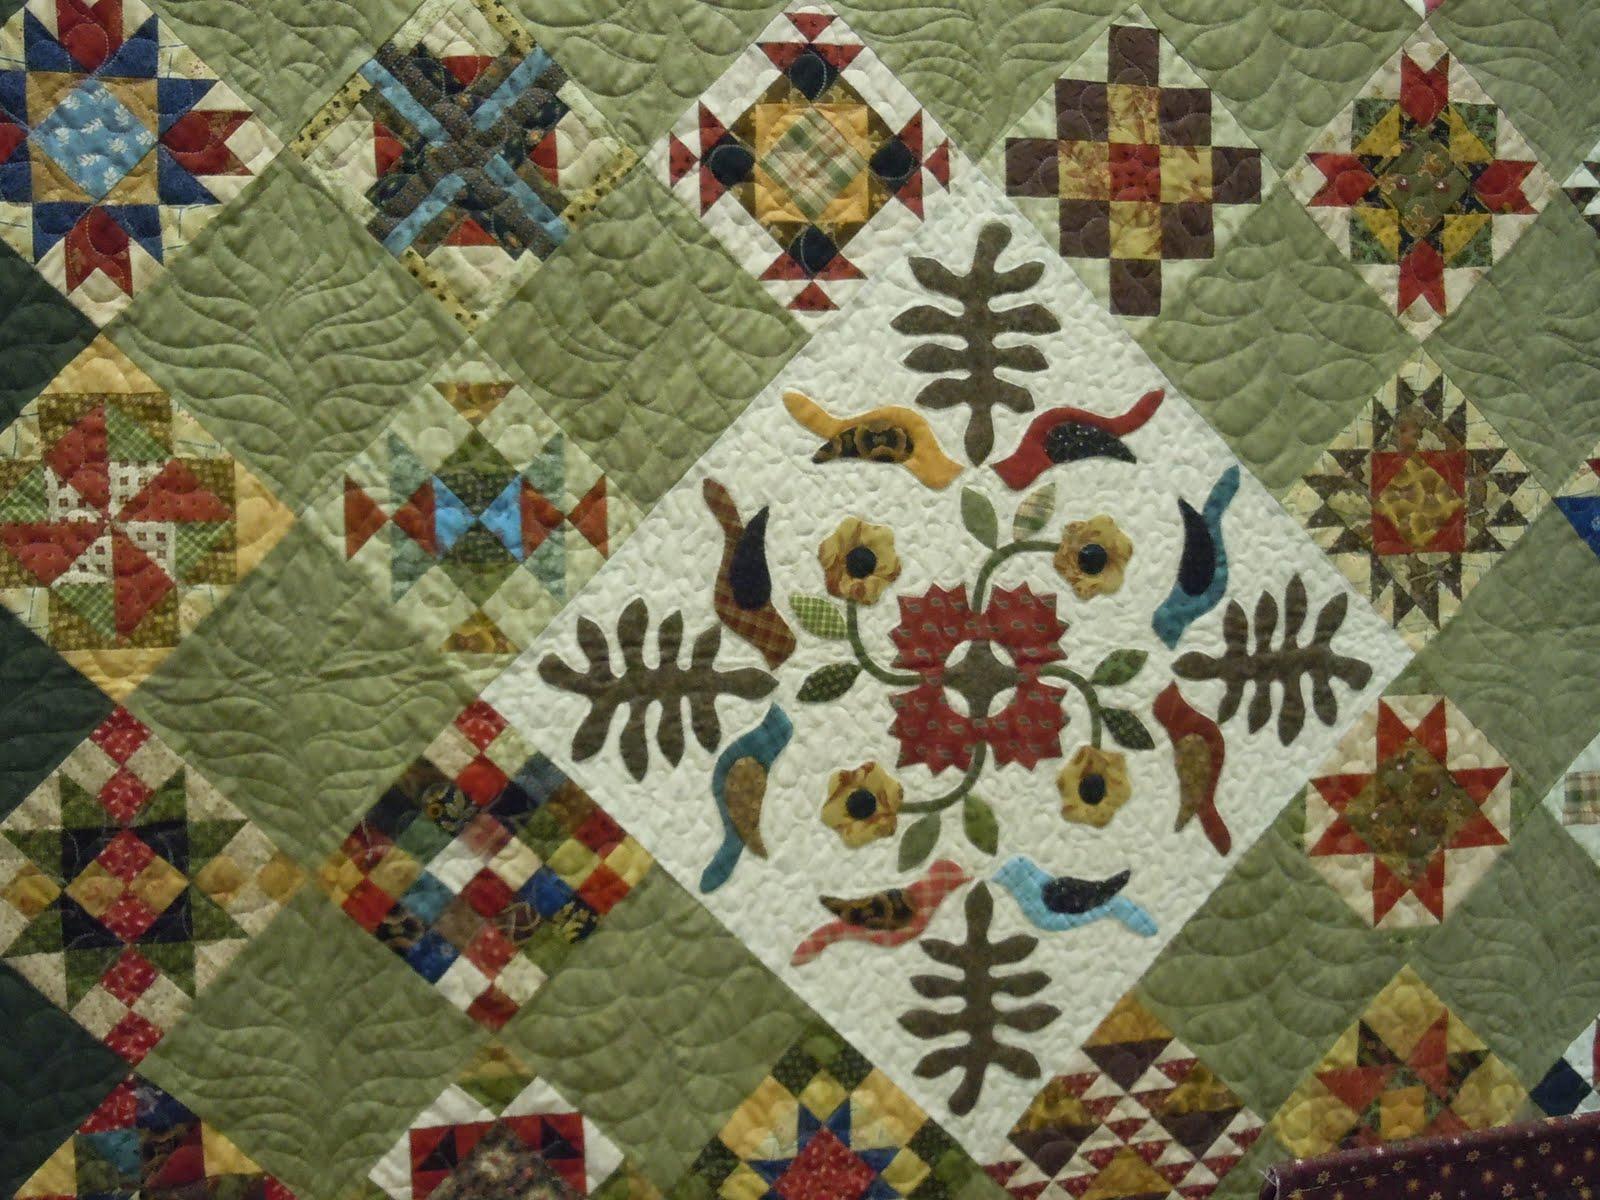 1 More Stitch Civil War Quilt Exhibit